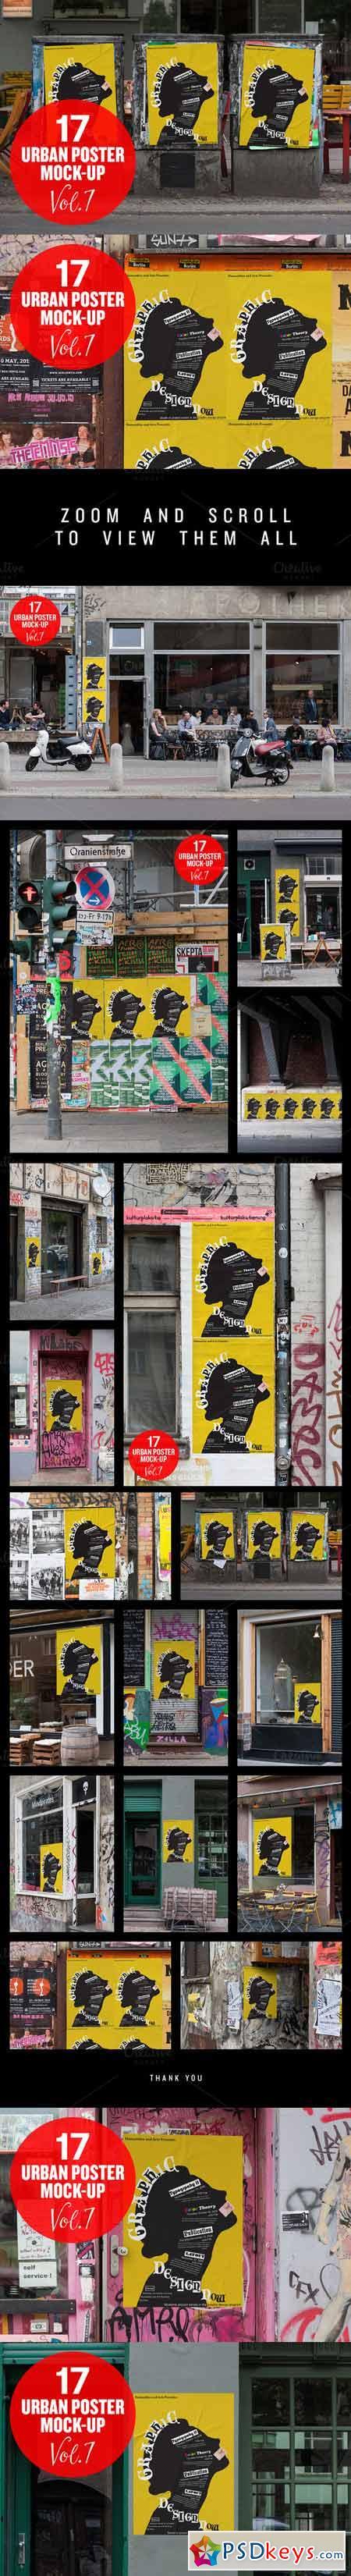 Urban Poster Mock-up VOL.7